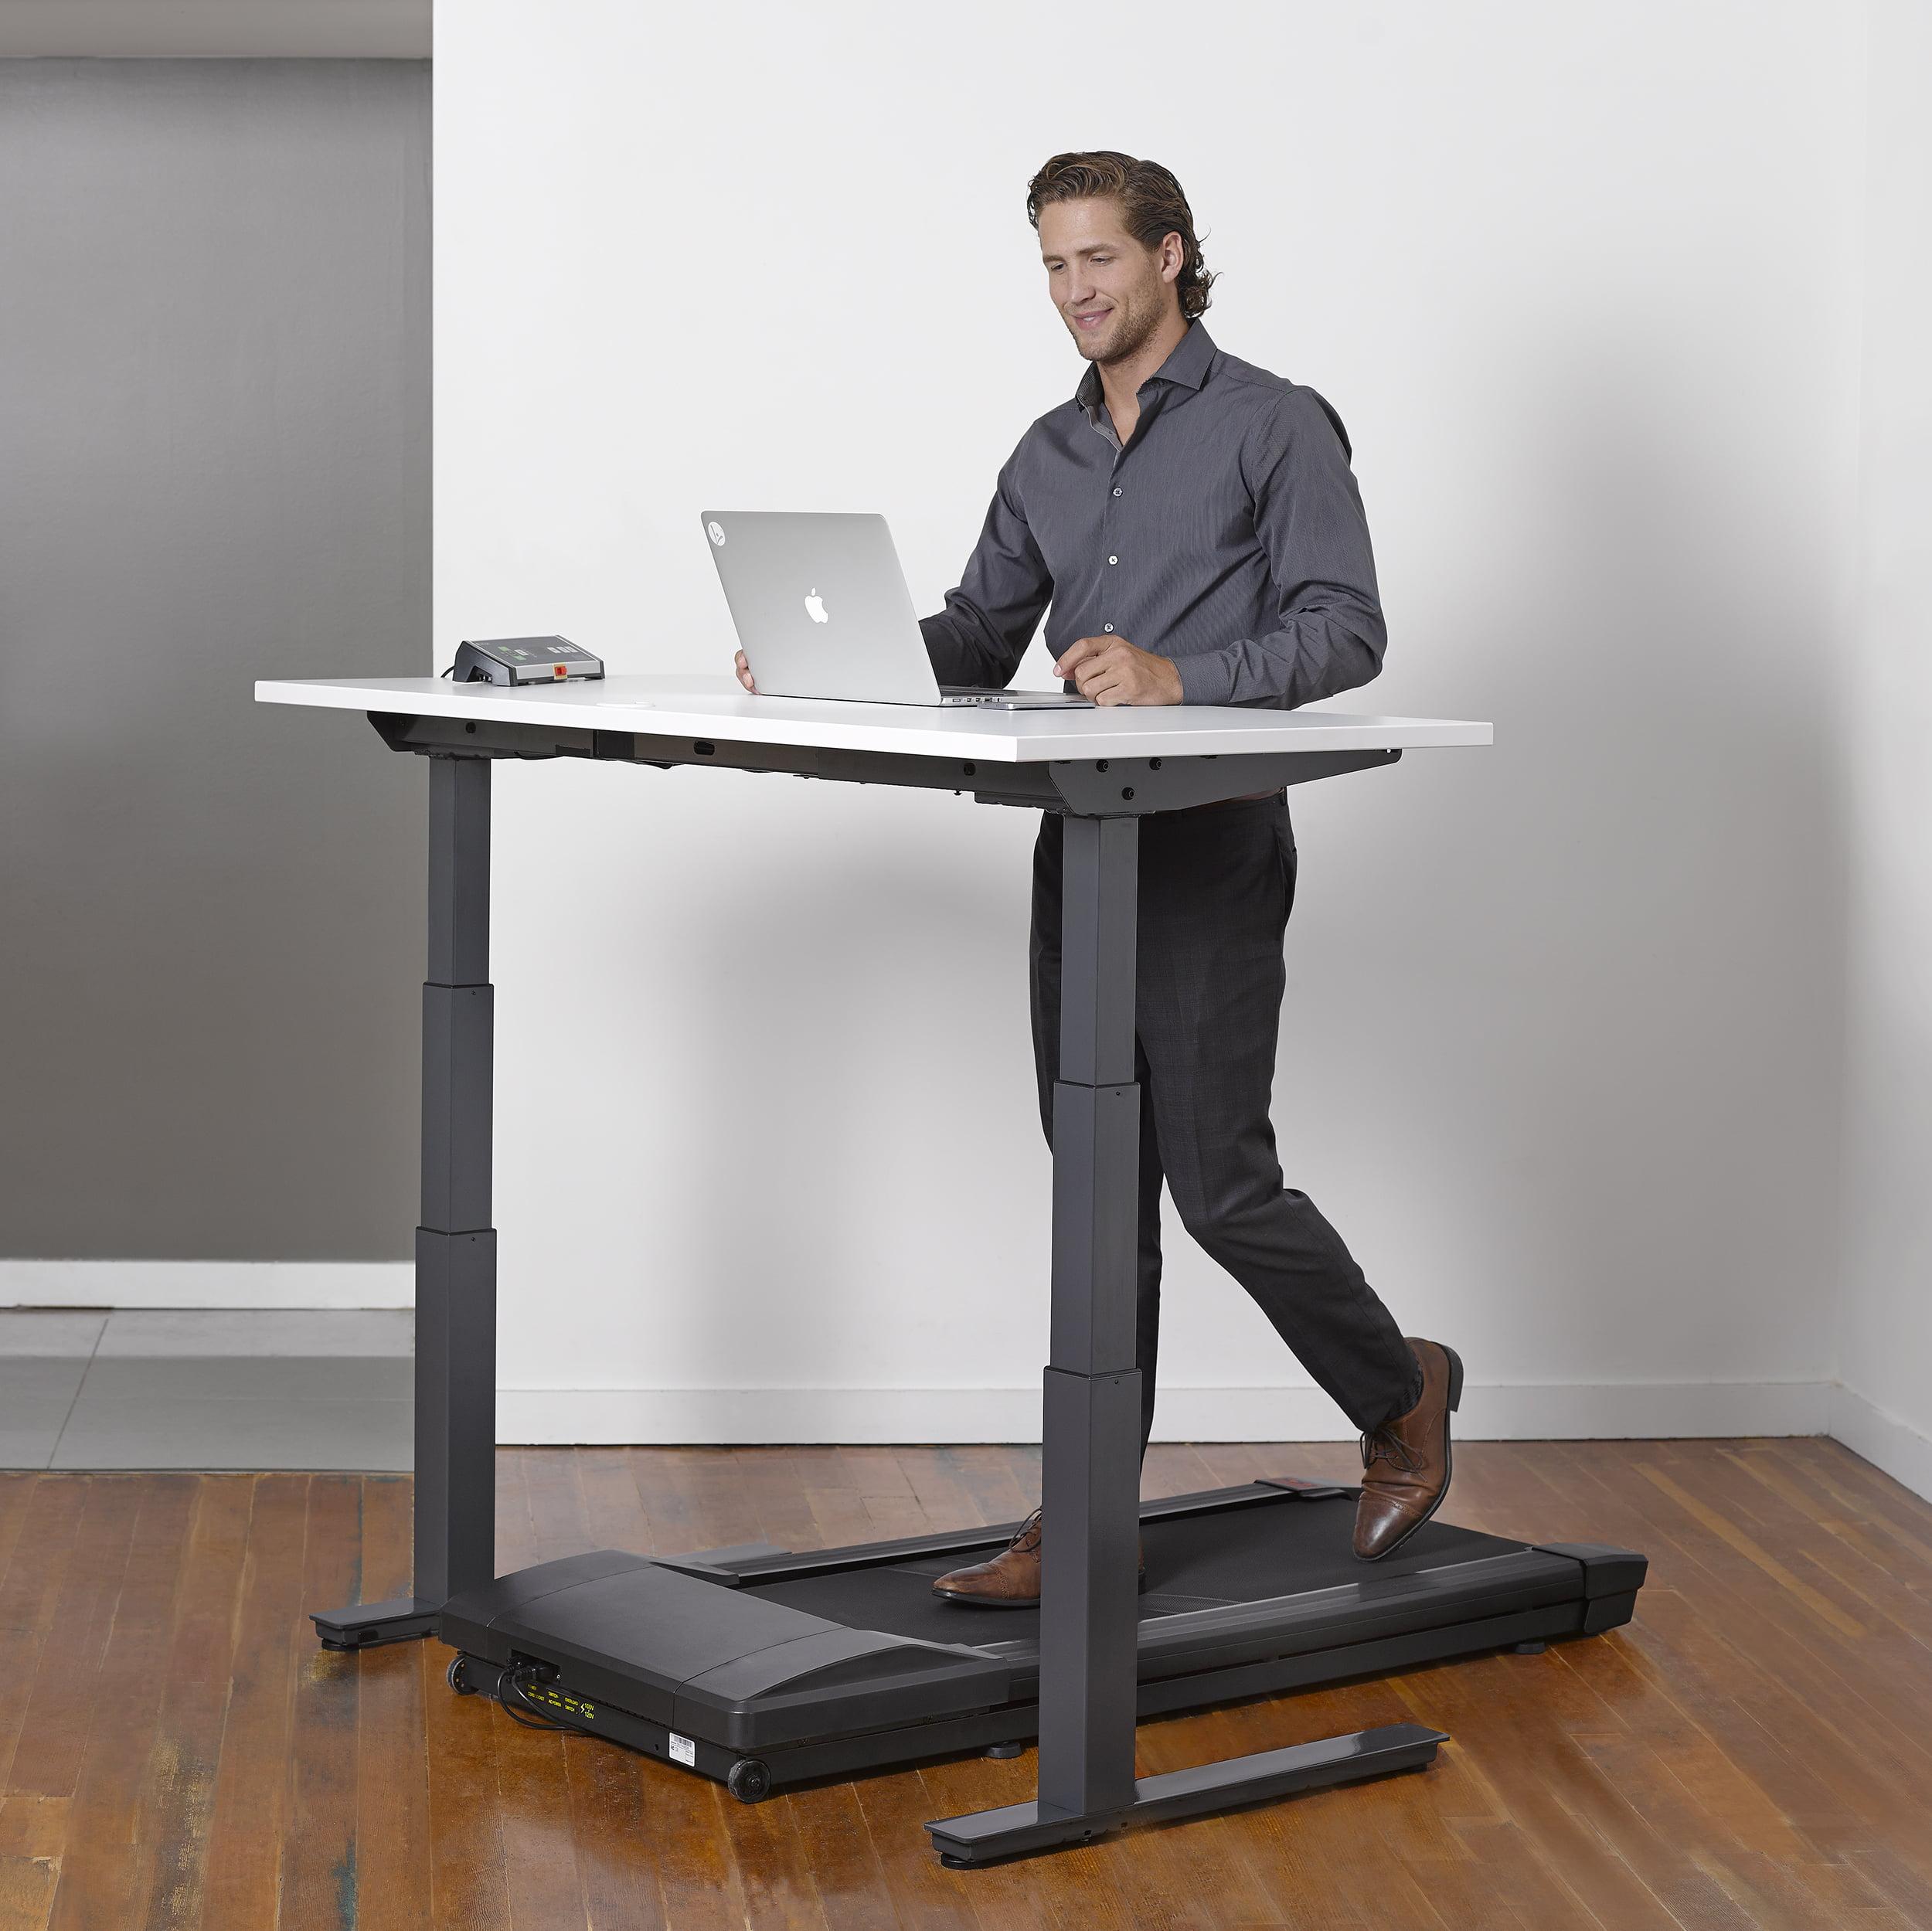 desk under jpg treadmill library harrisburg adds librarynews news